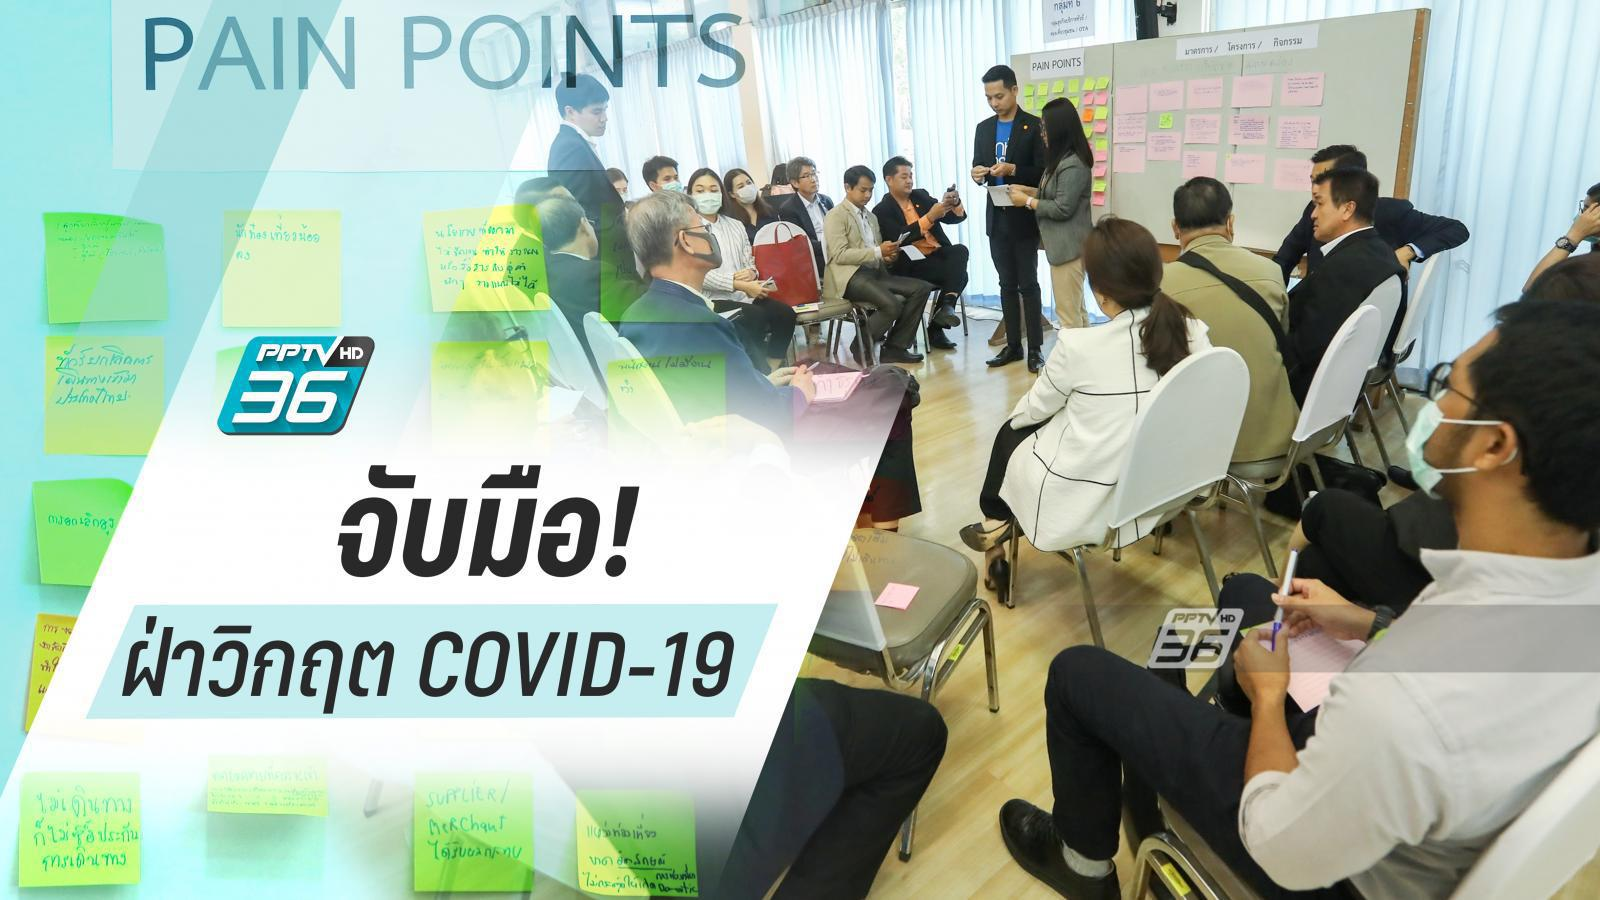 PPTVHD36 เปิดพื้นที่ออนไลน์ช่วยเอกชนฝ่าวิกฤต COVID-19